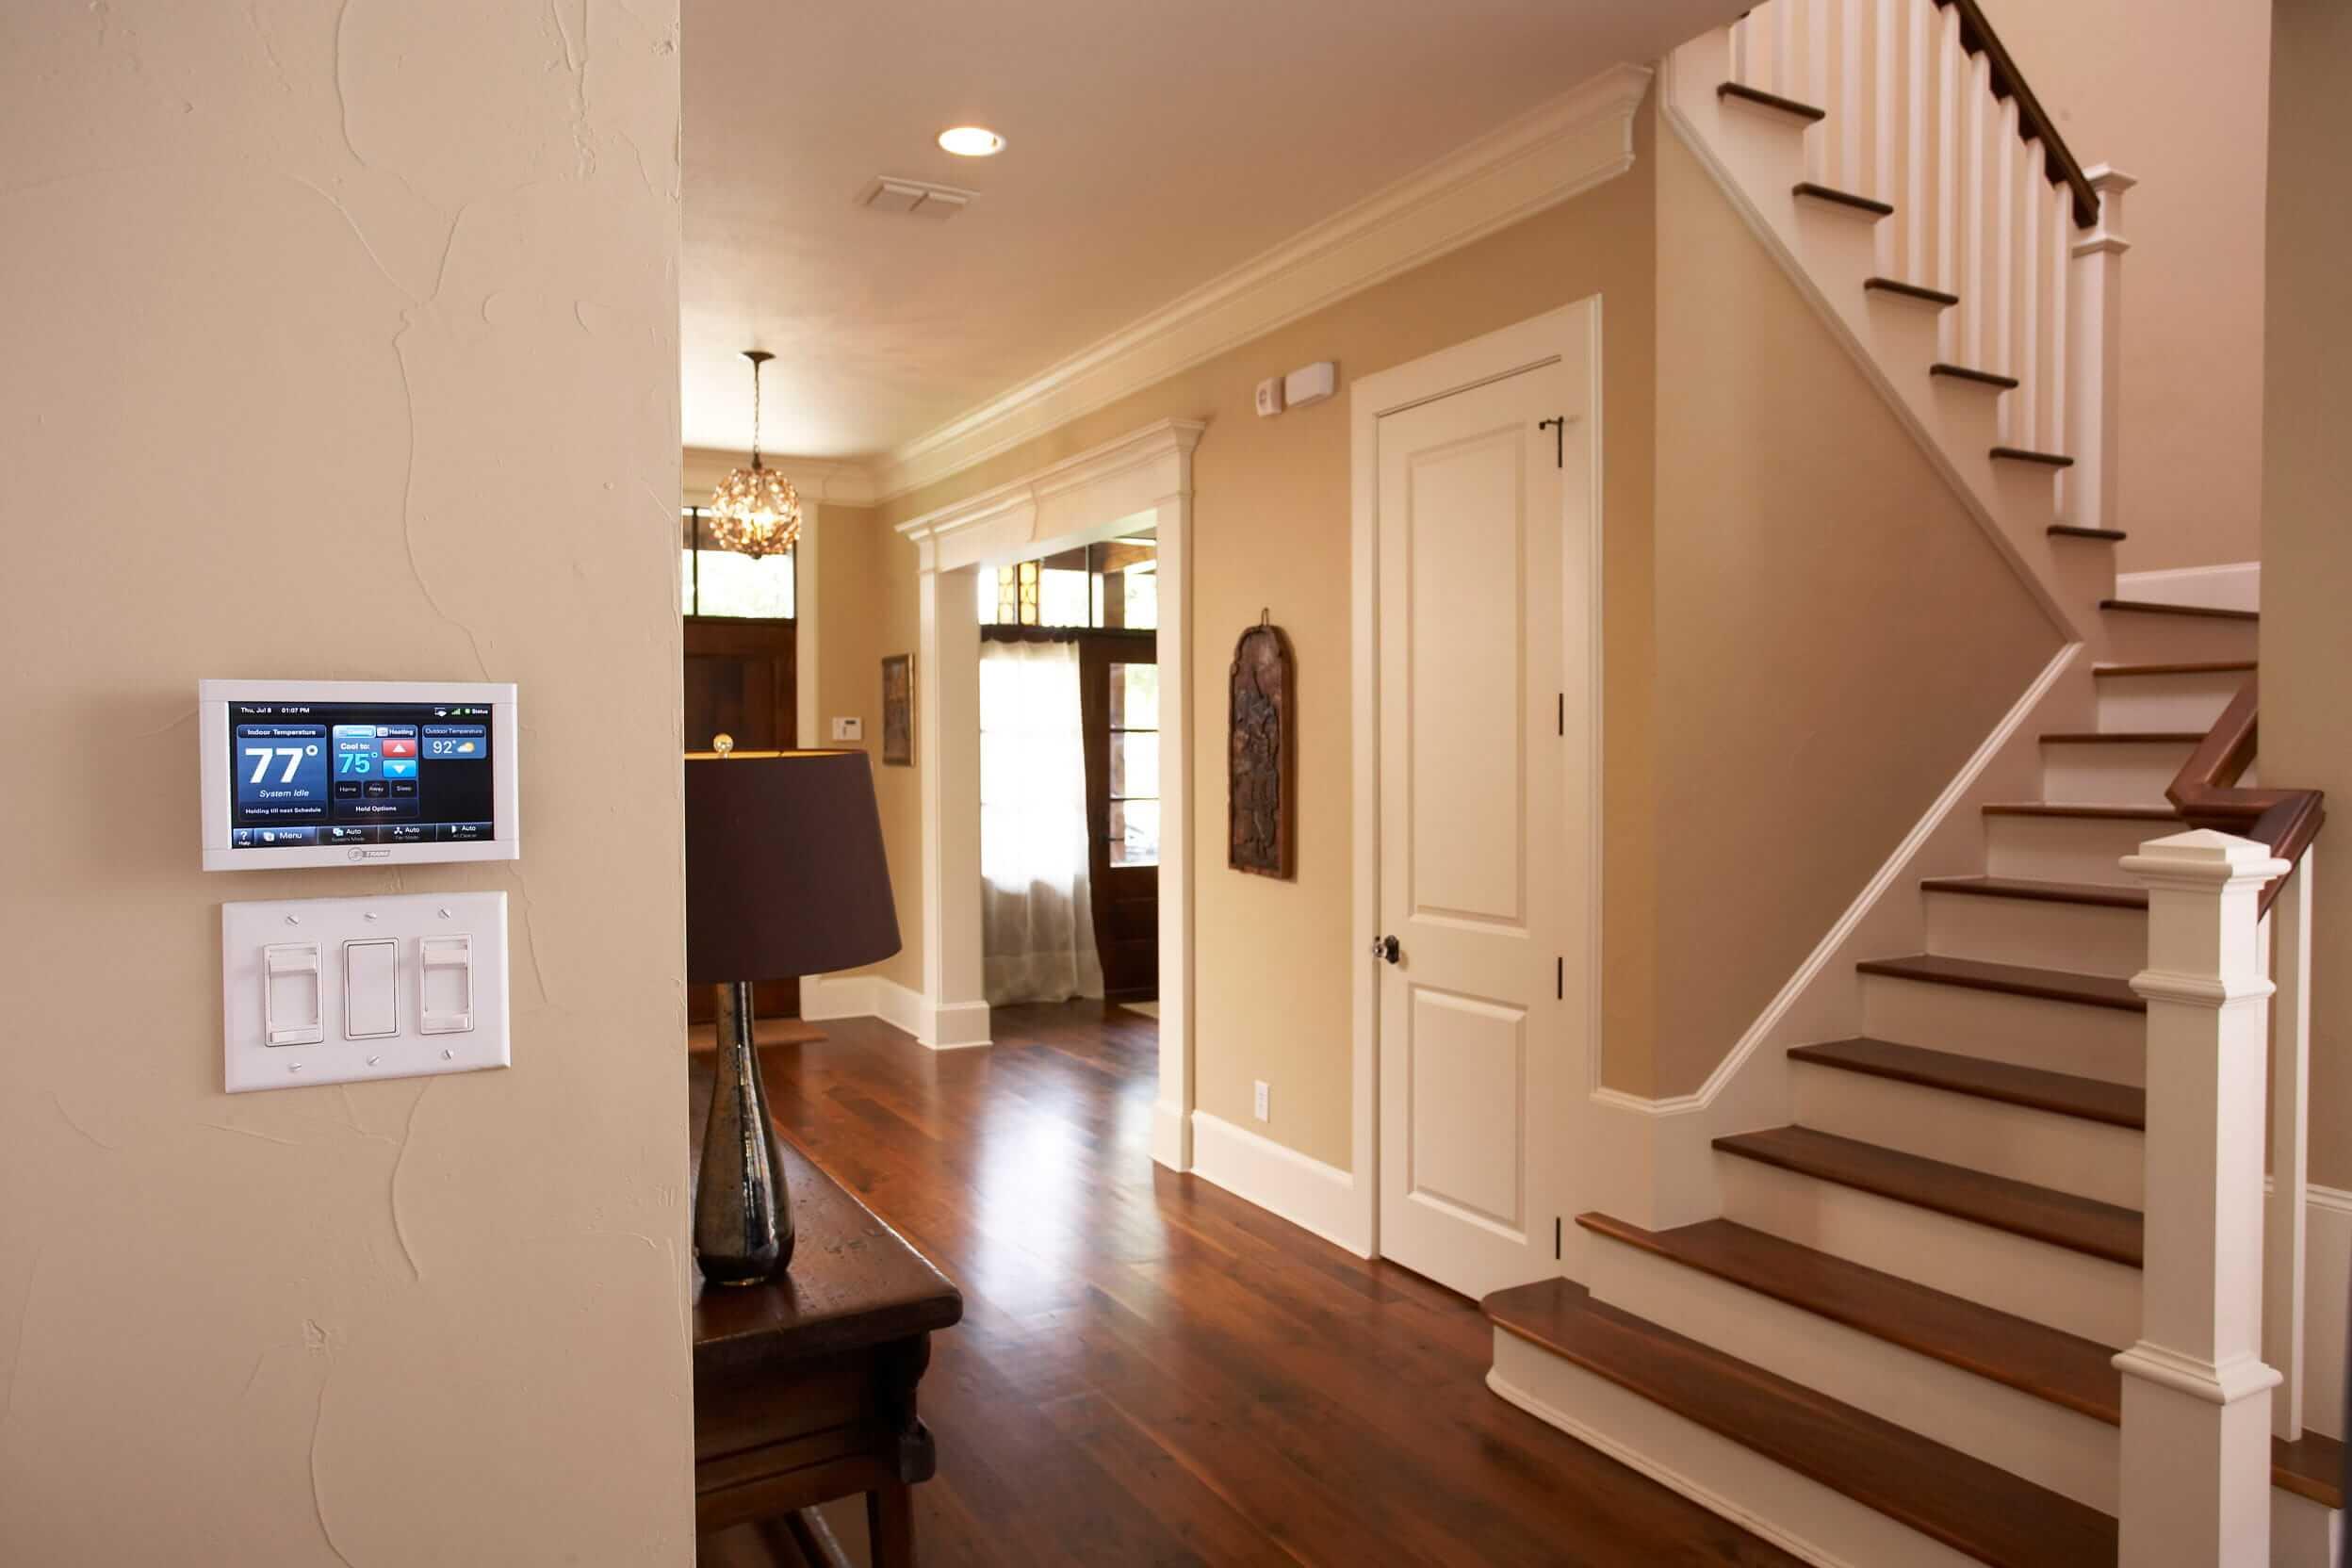 Trane smart thermostats